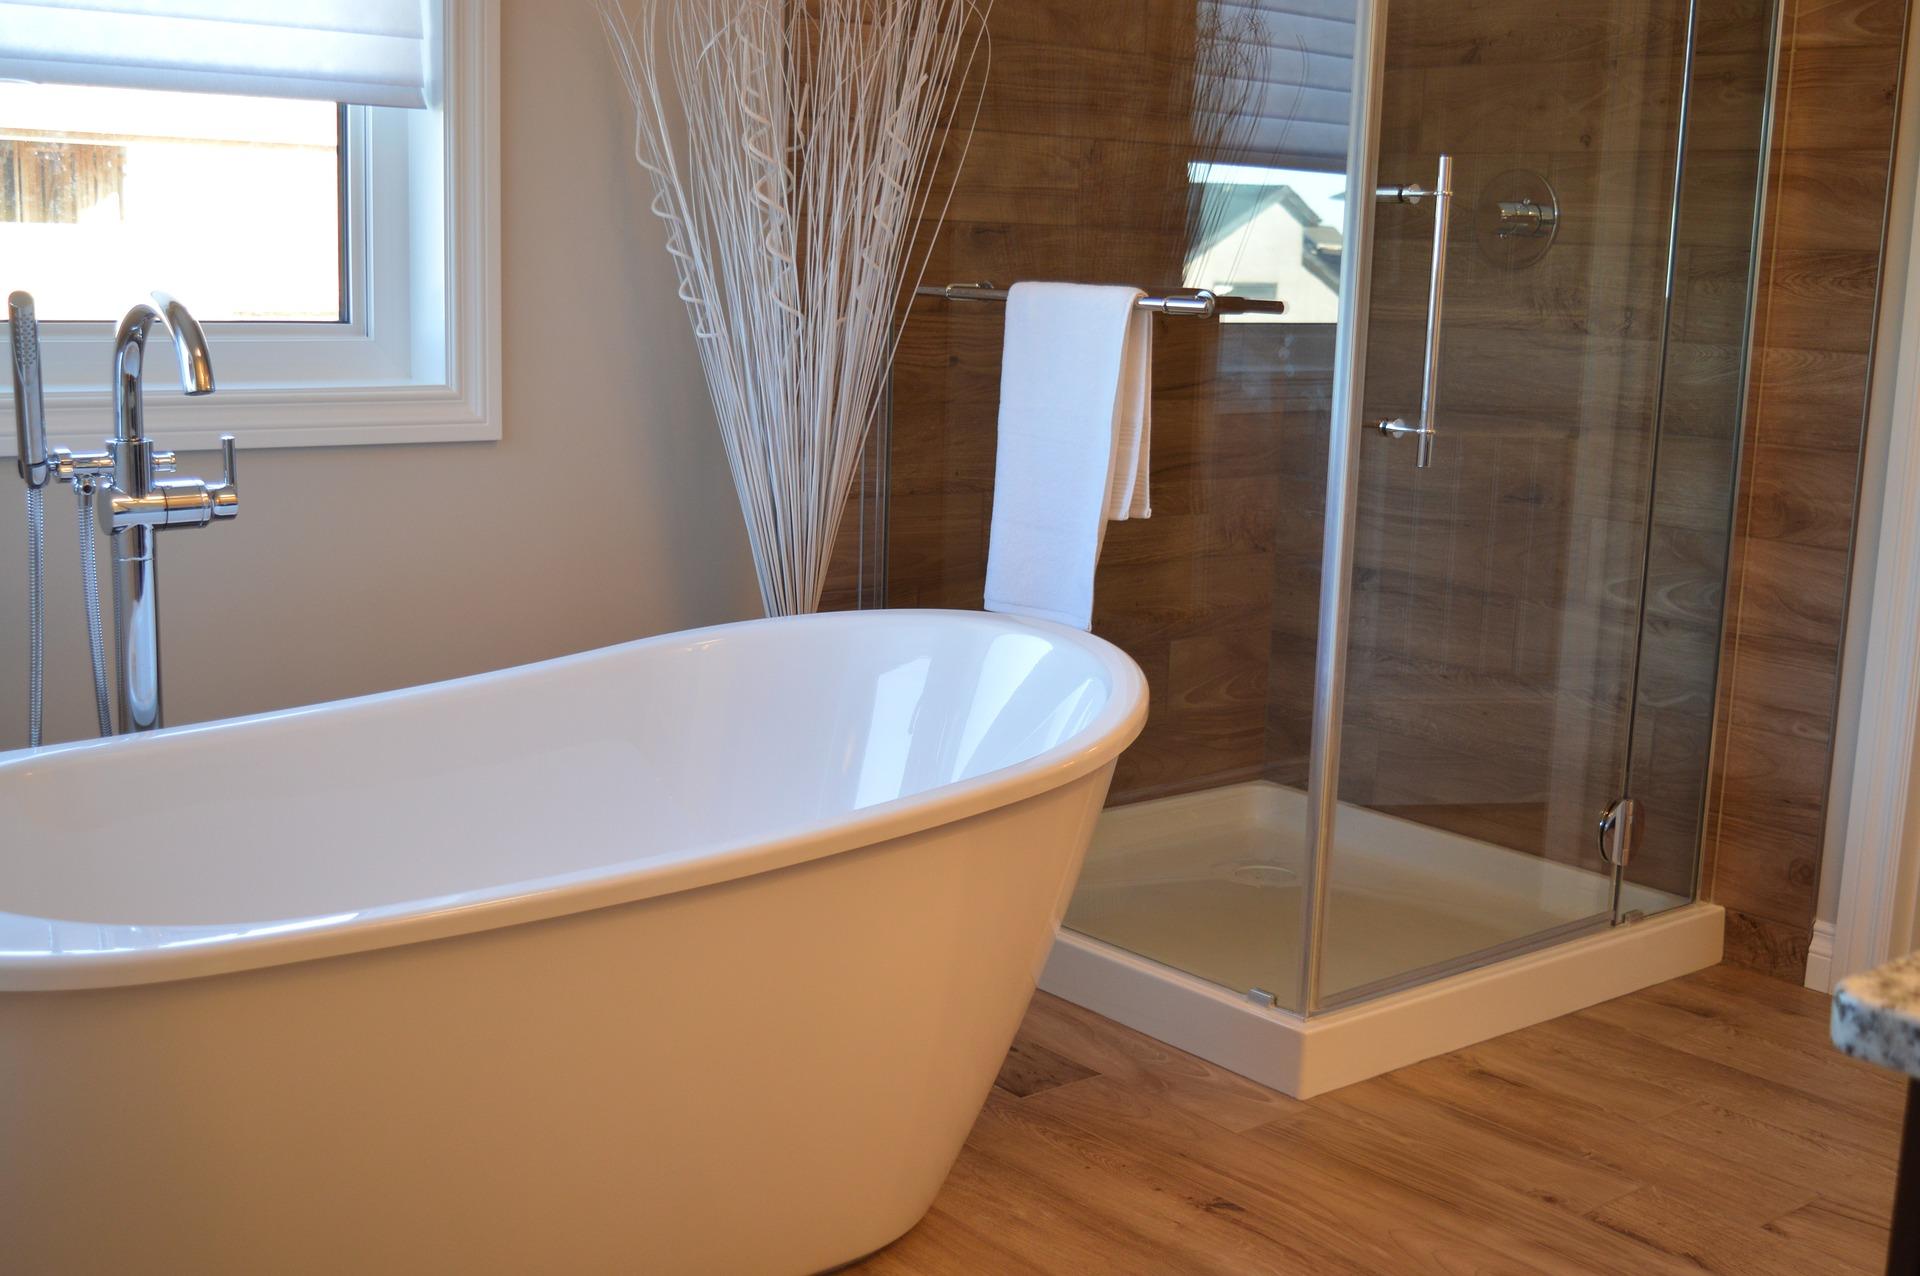 Dusche-Badewanne-Holzoptik